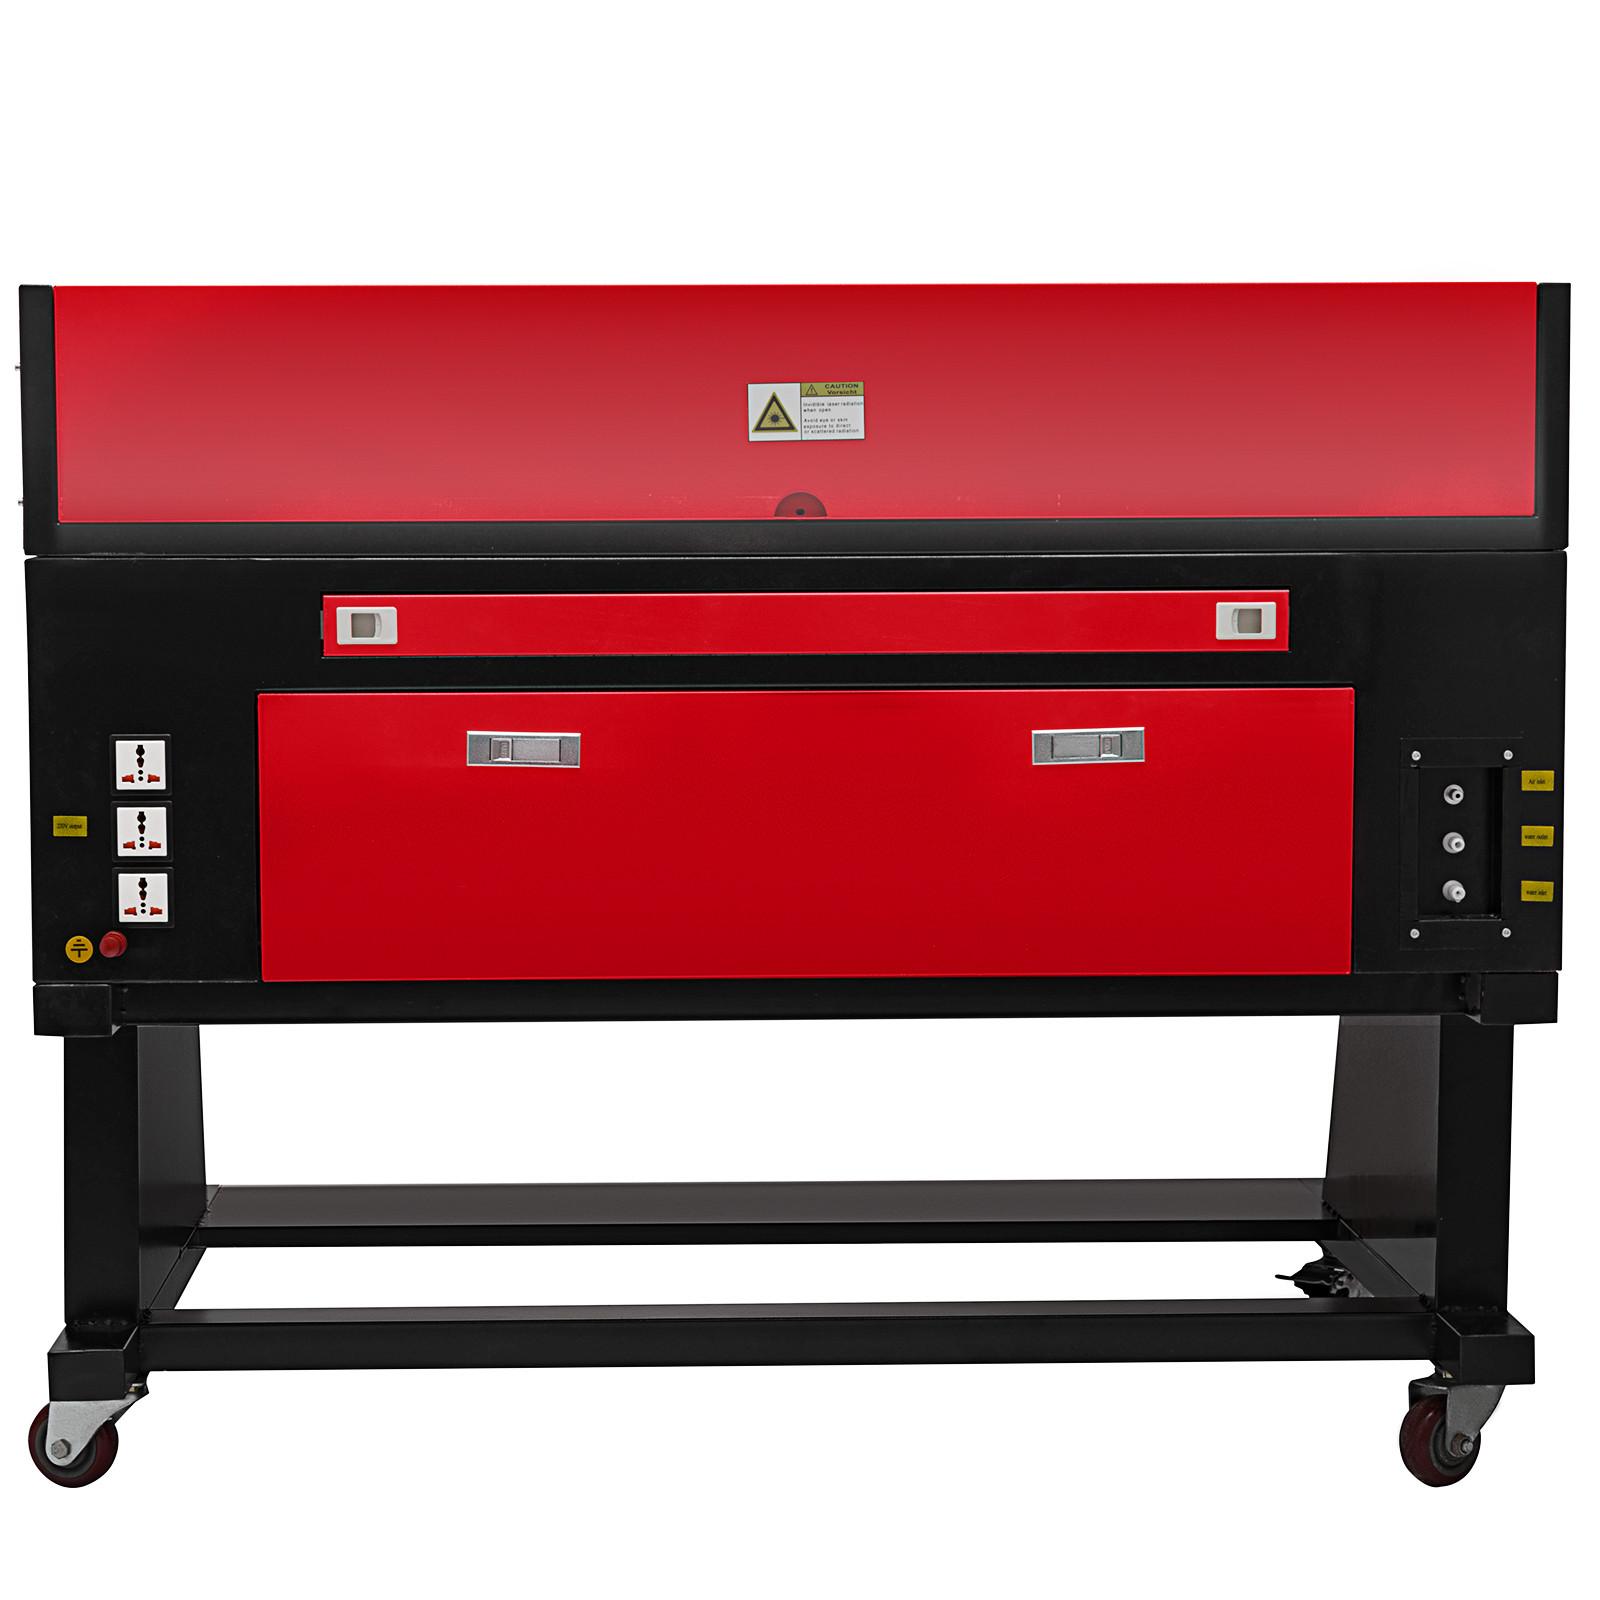 Macchina-per-Incisione-Laser-CO2-40-130W-Asse-Rotante-Tagliatrice-Incisore miniatura 51